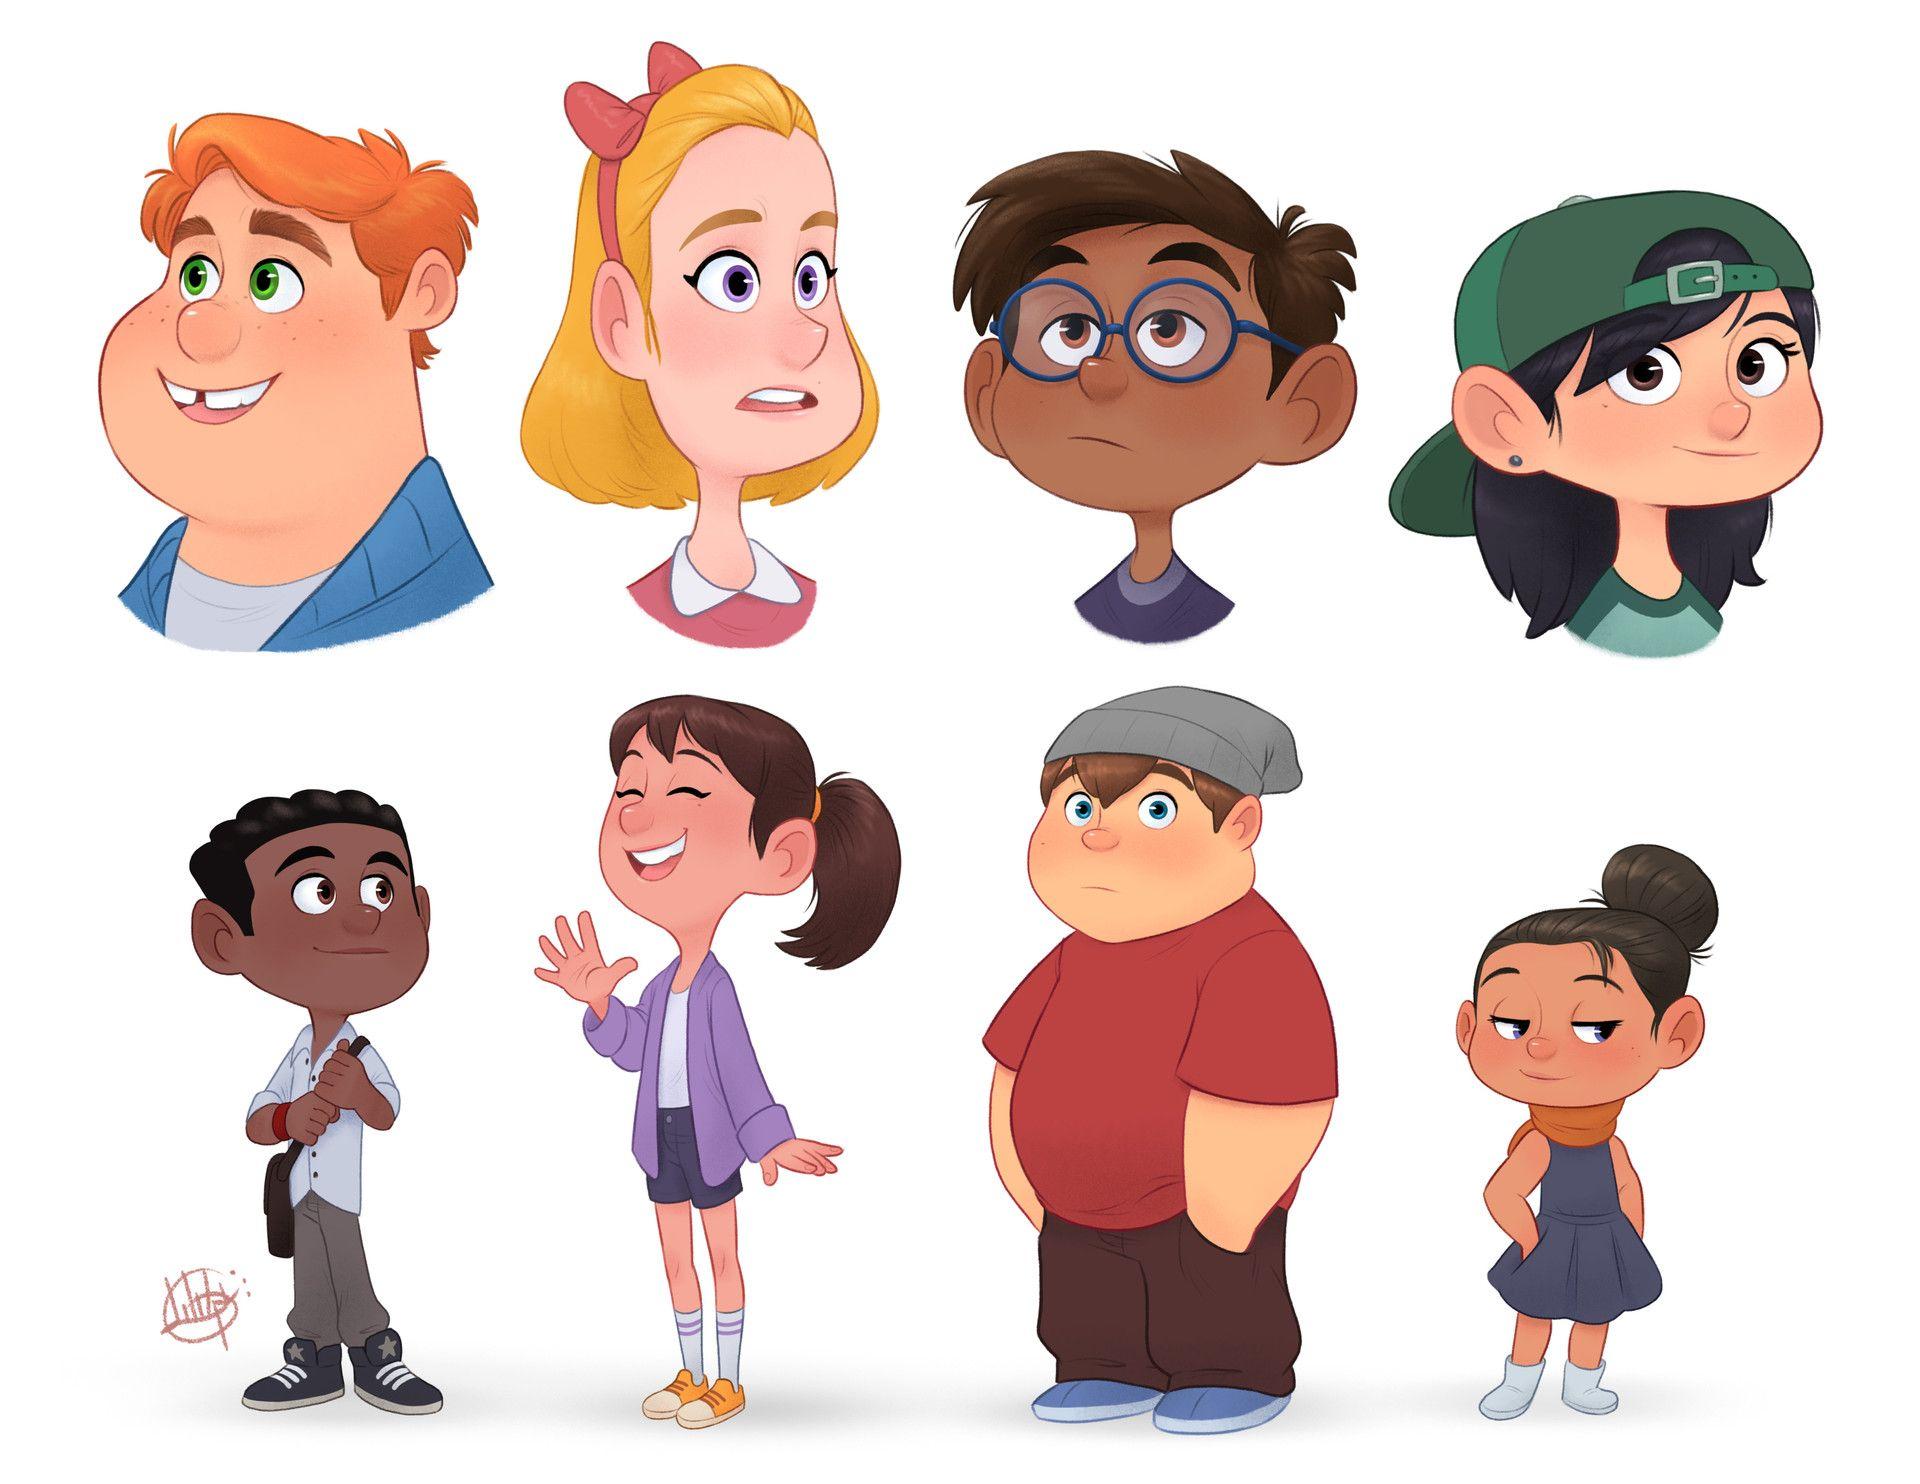 ArtStation - Random Characters 4, Luigi Lucarelli | cartoon